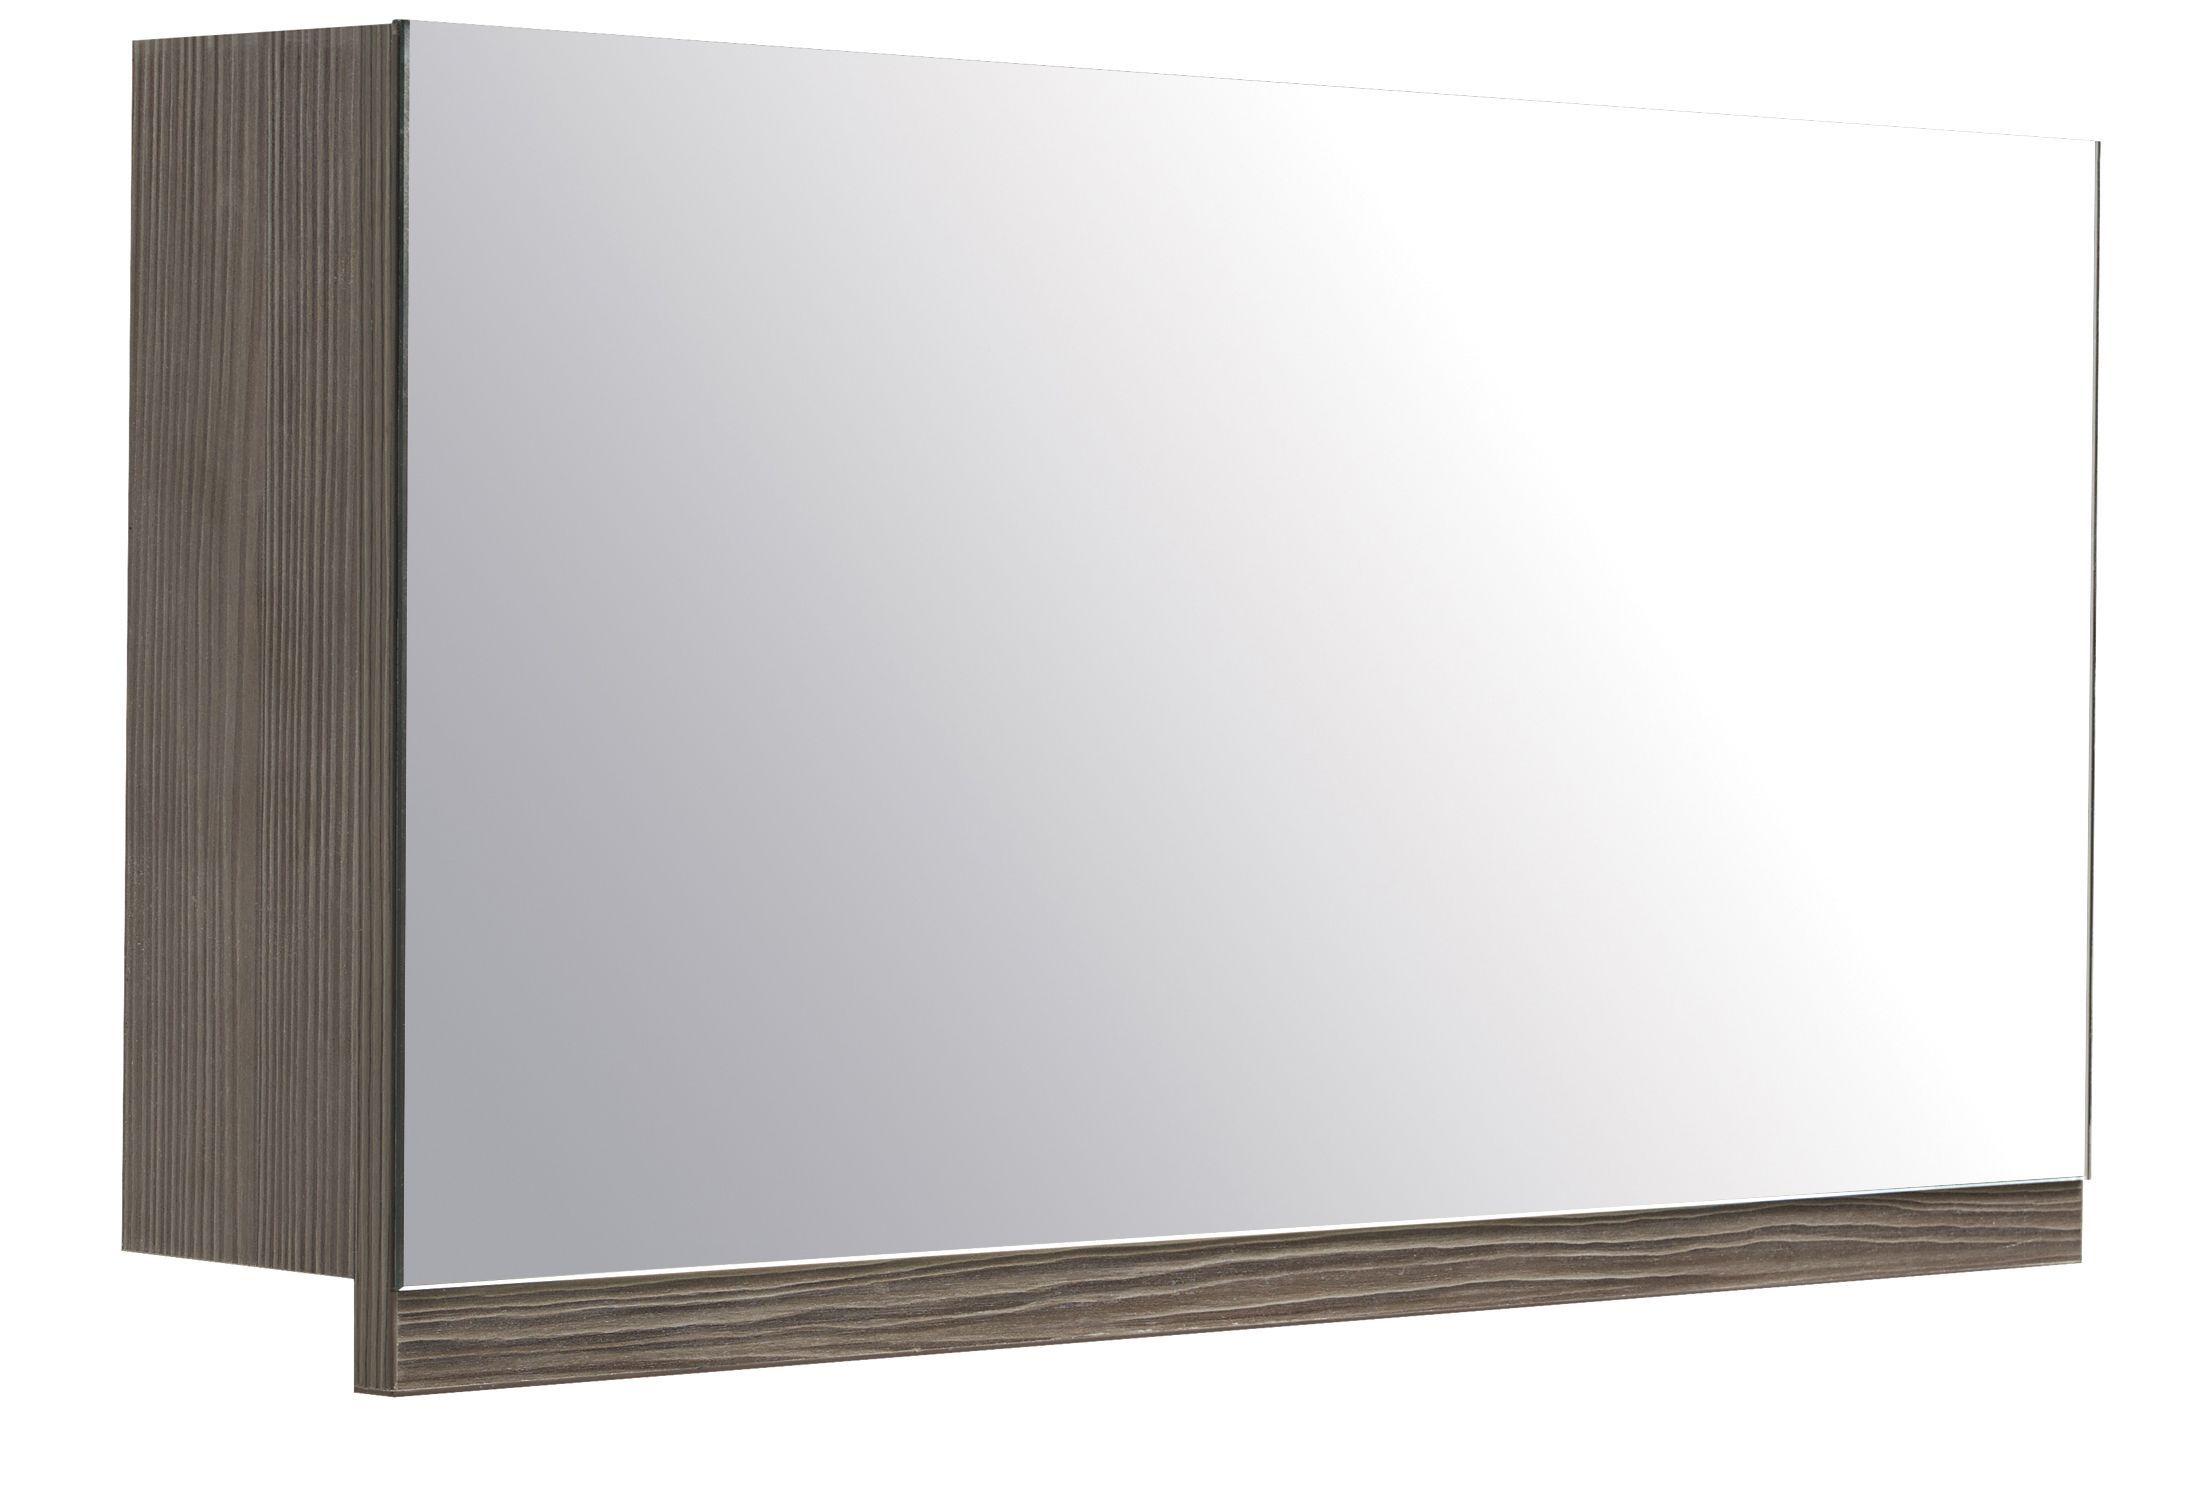 cooke lewis ardesio single door bodega grey mirror cabinet